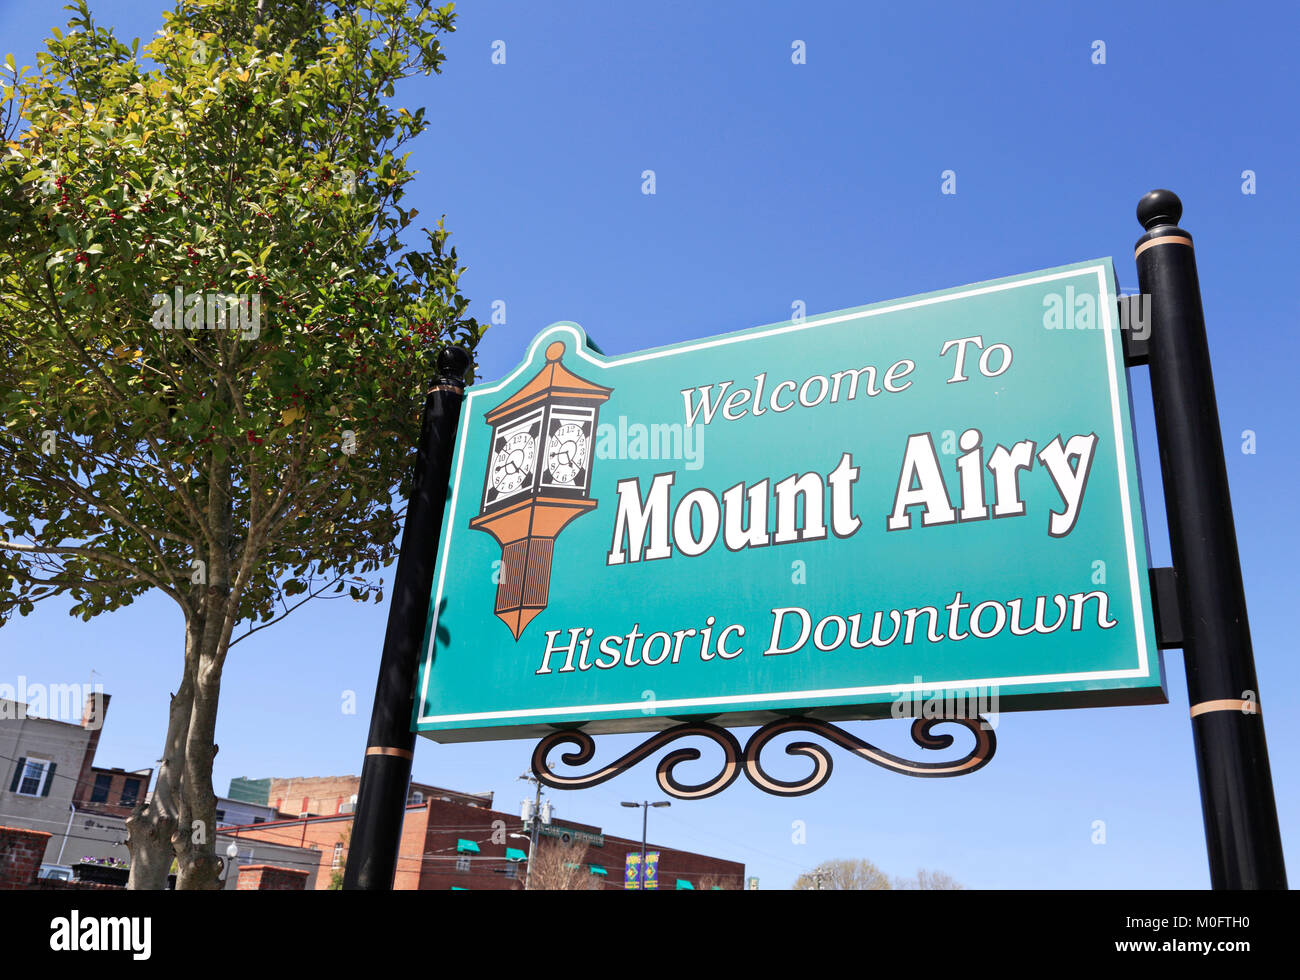 Mount Airy, North Carolina. Historic downtown. Stock Photo